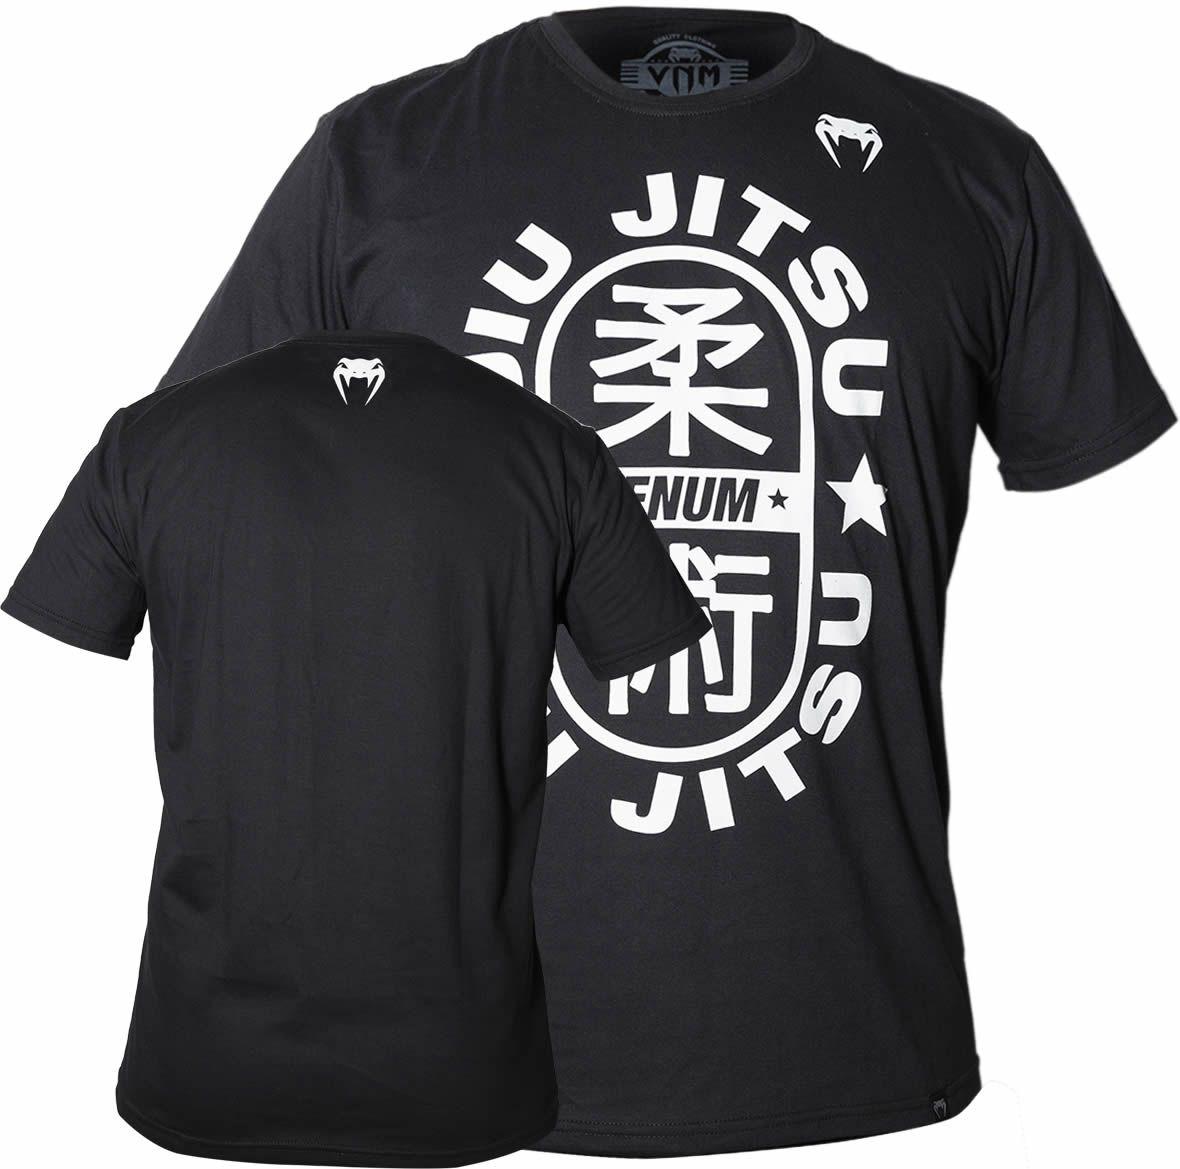 Camisa Camiseta Jiu Jitsu Star - Preta - Venum Fight  - Loja do Competidor